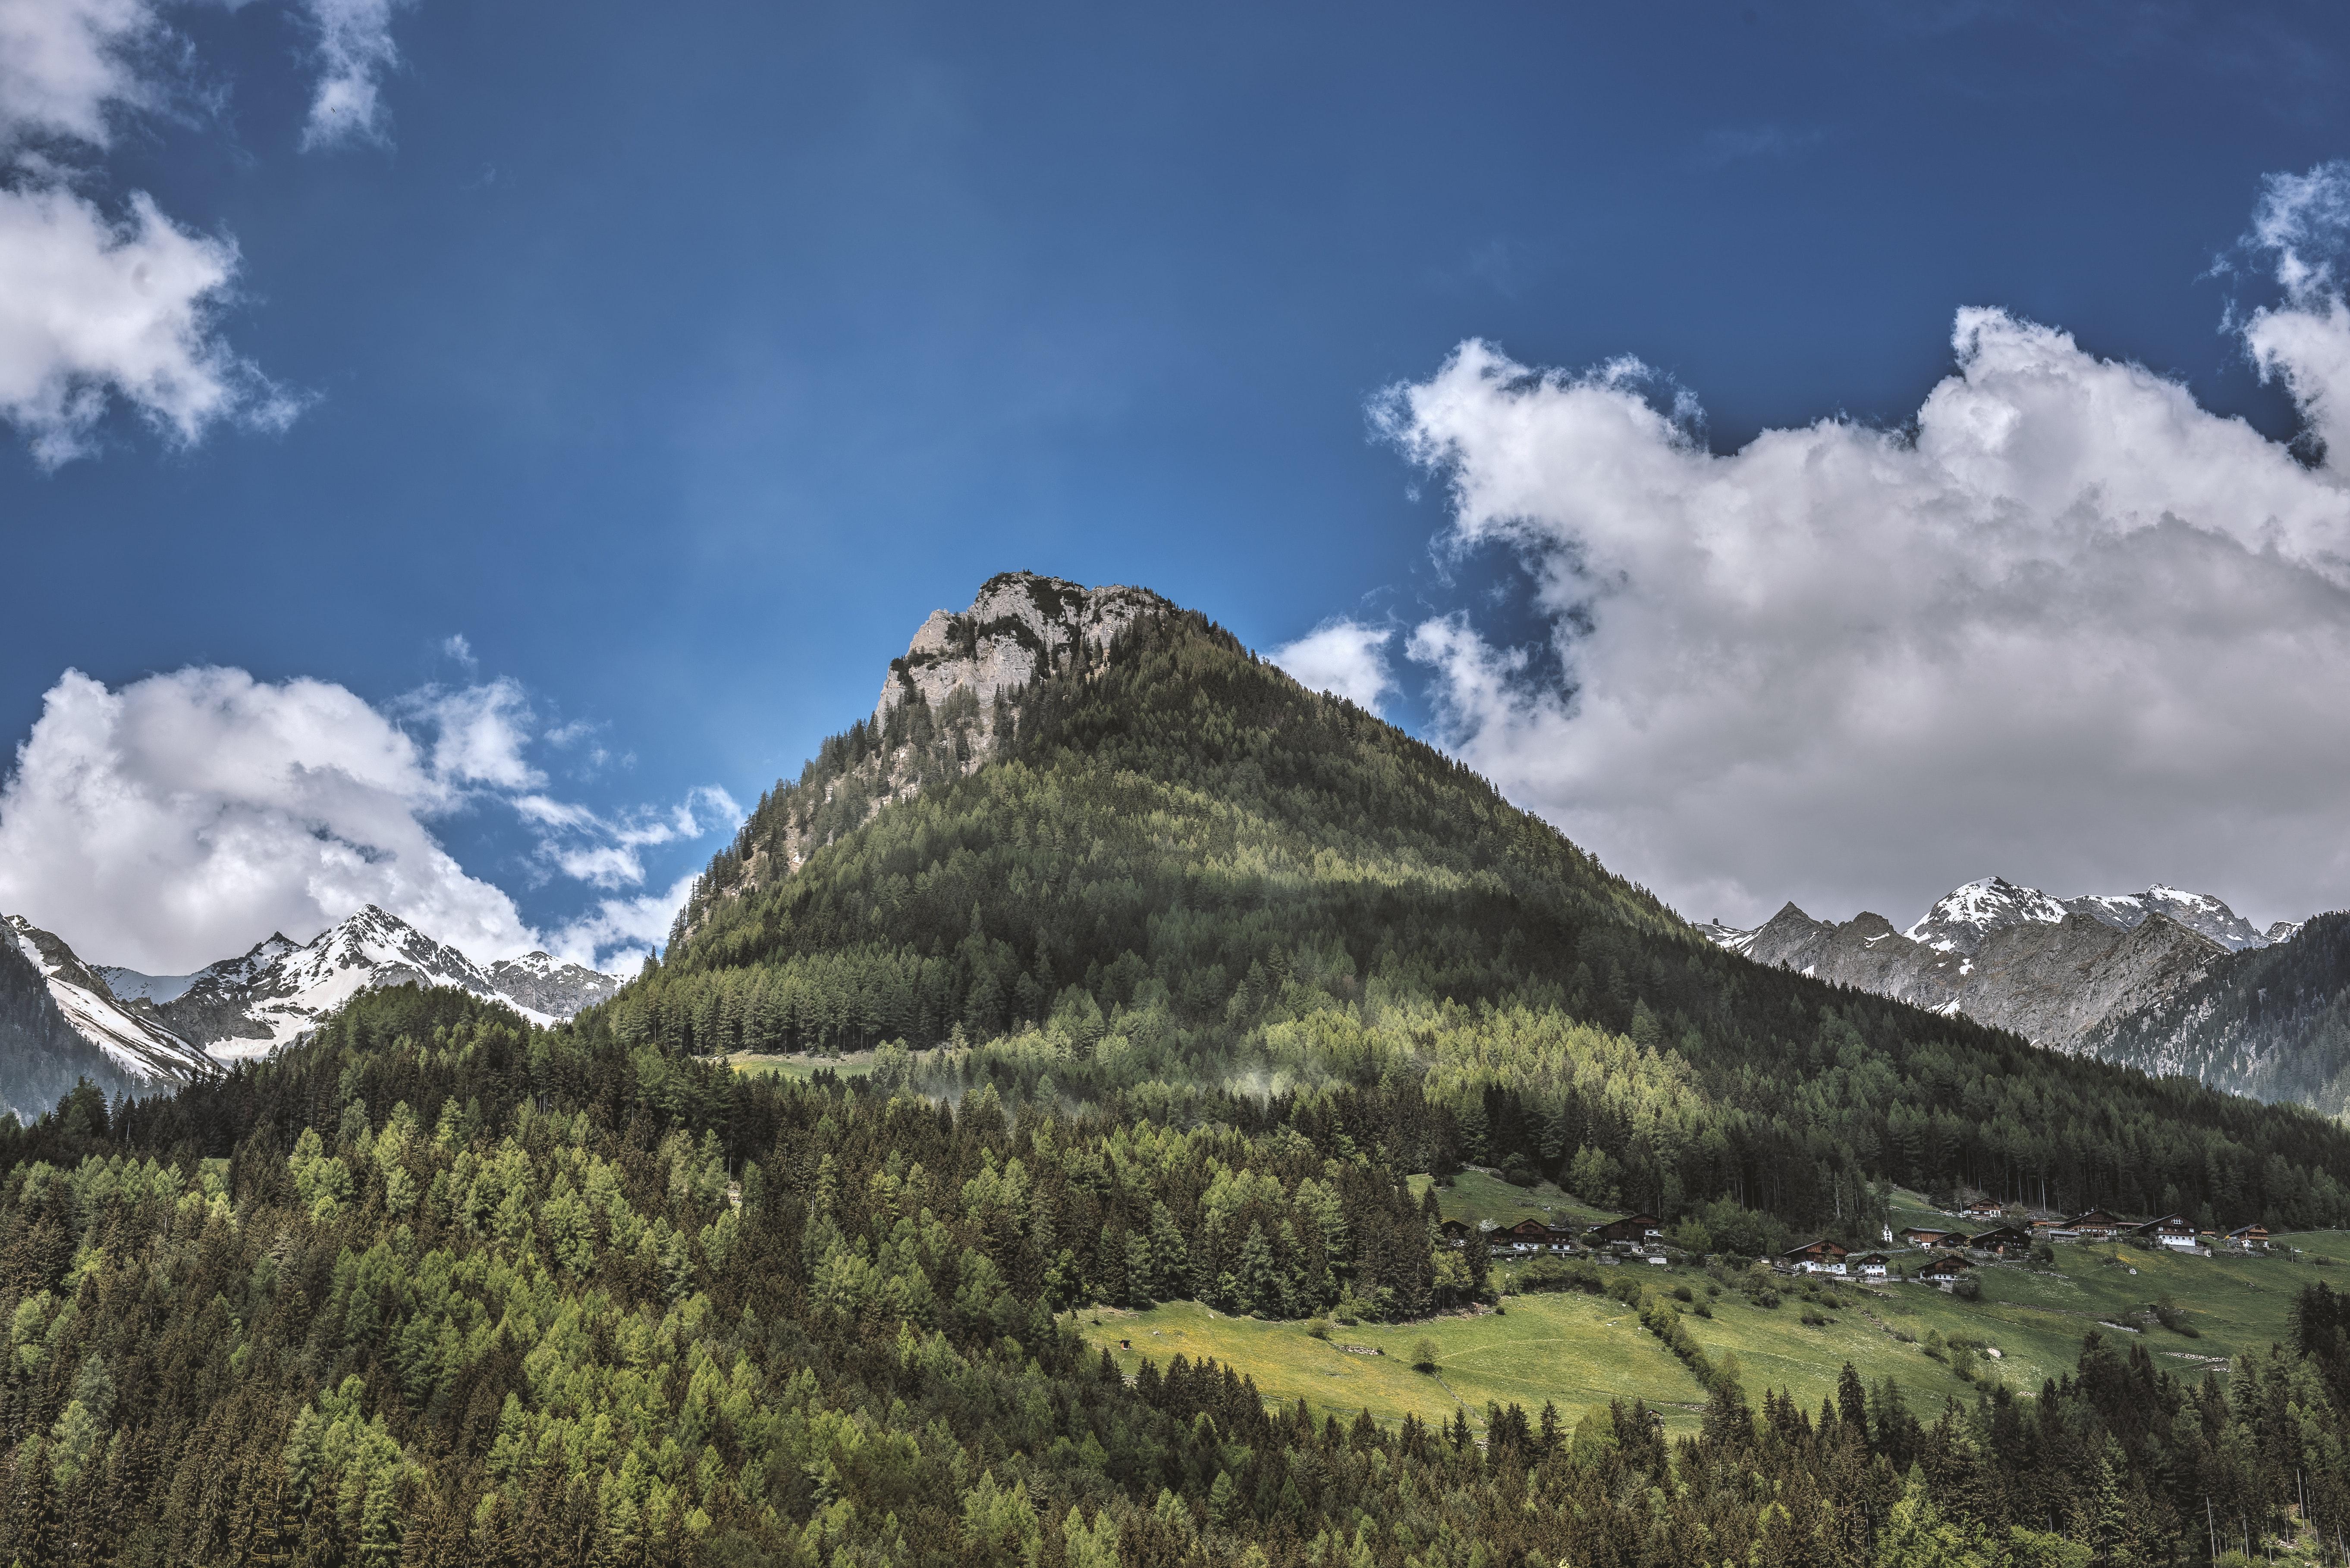 Free Images Adventure Clouds Conifer Daylight Desktop